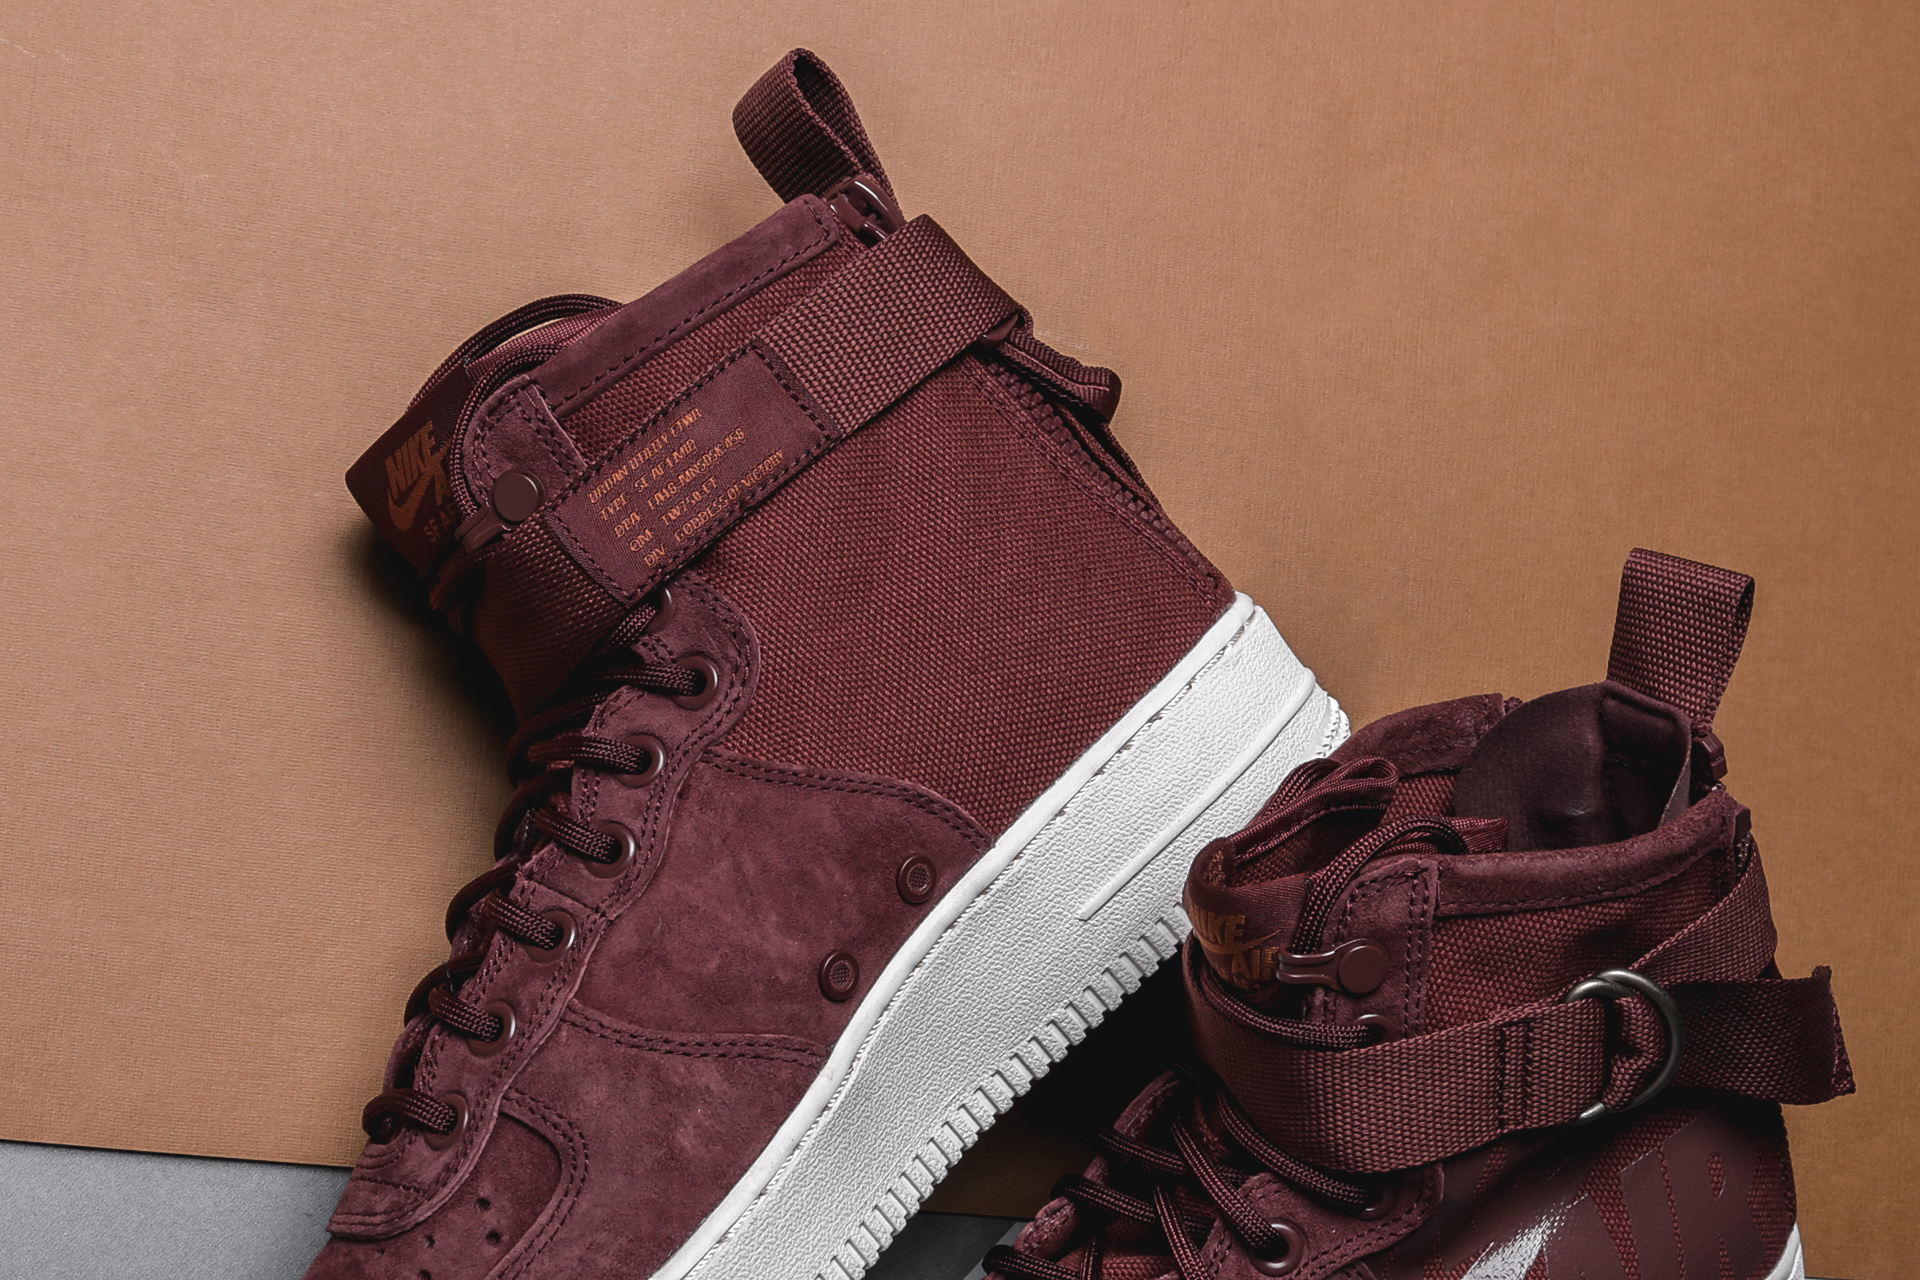 5ff2fc50f643 ... Купить мужские коричневые кроссовки Nike SF Air Force 1 Mid - фото 4  картинки ...